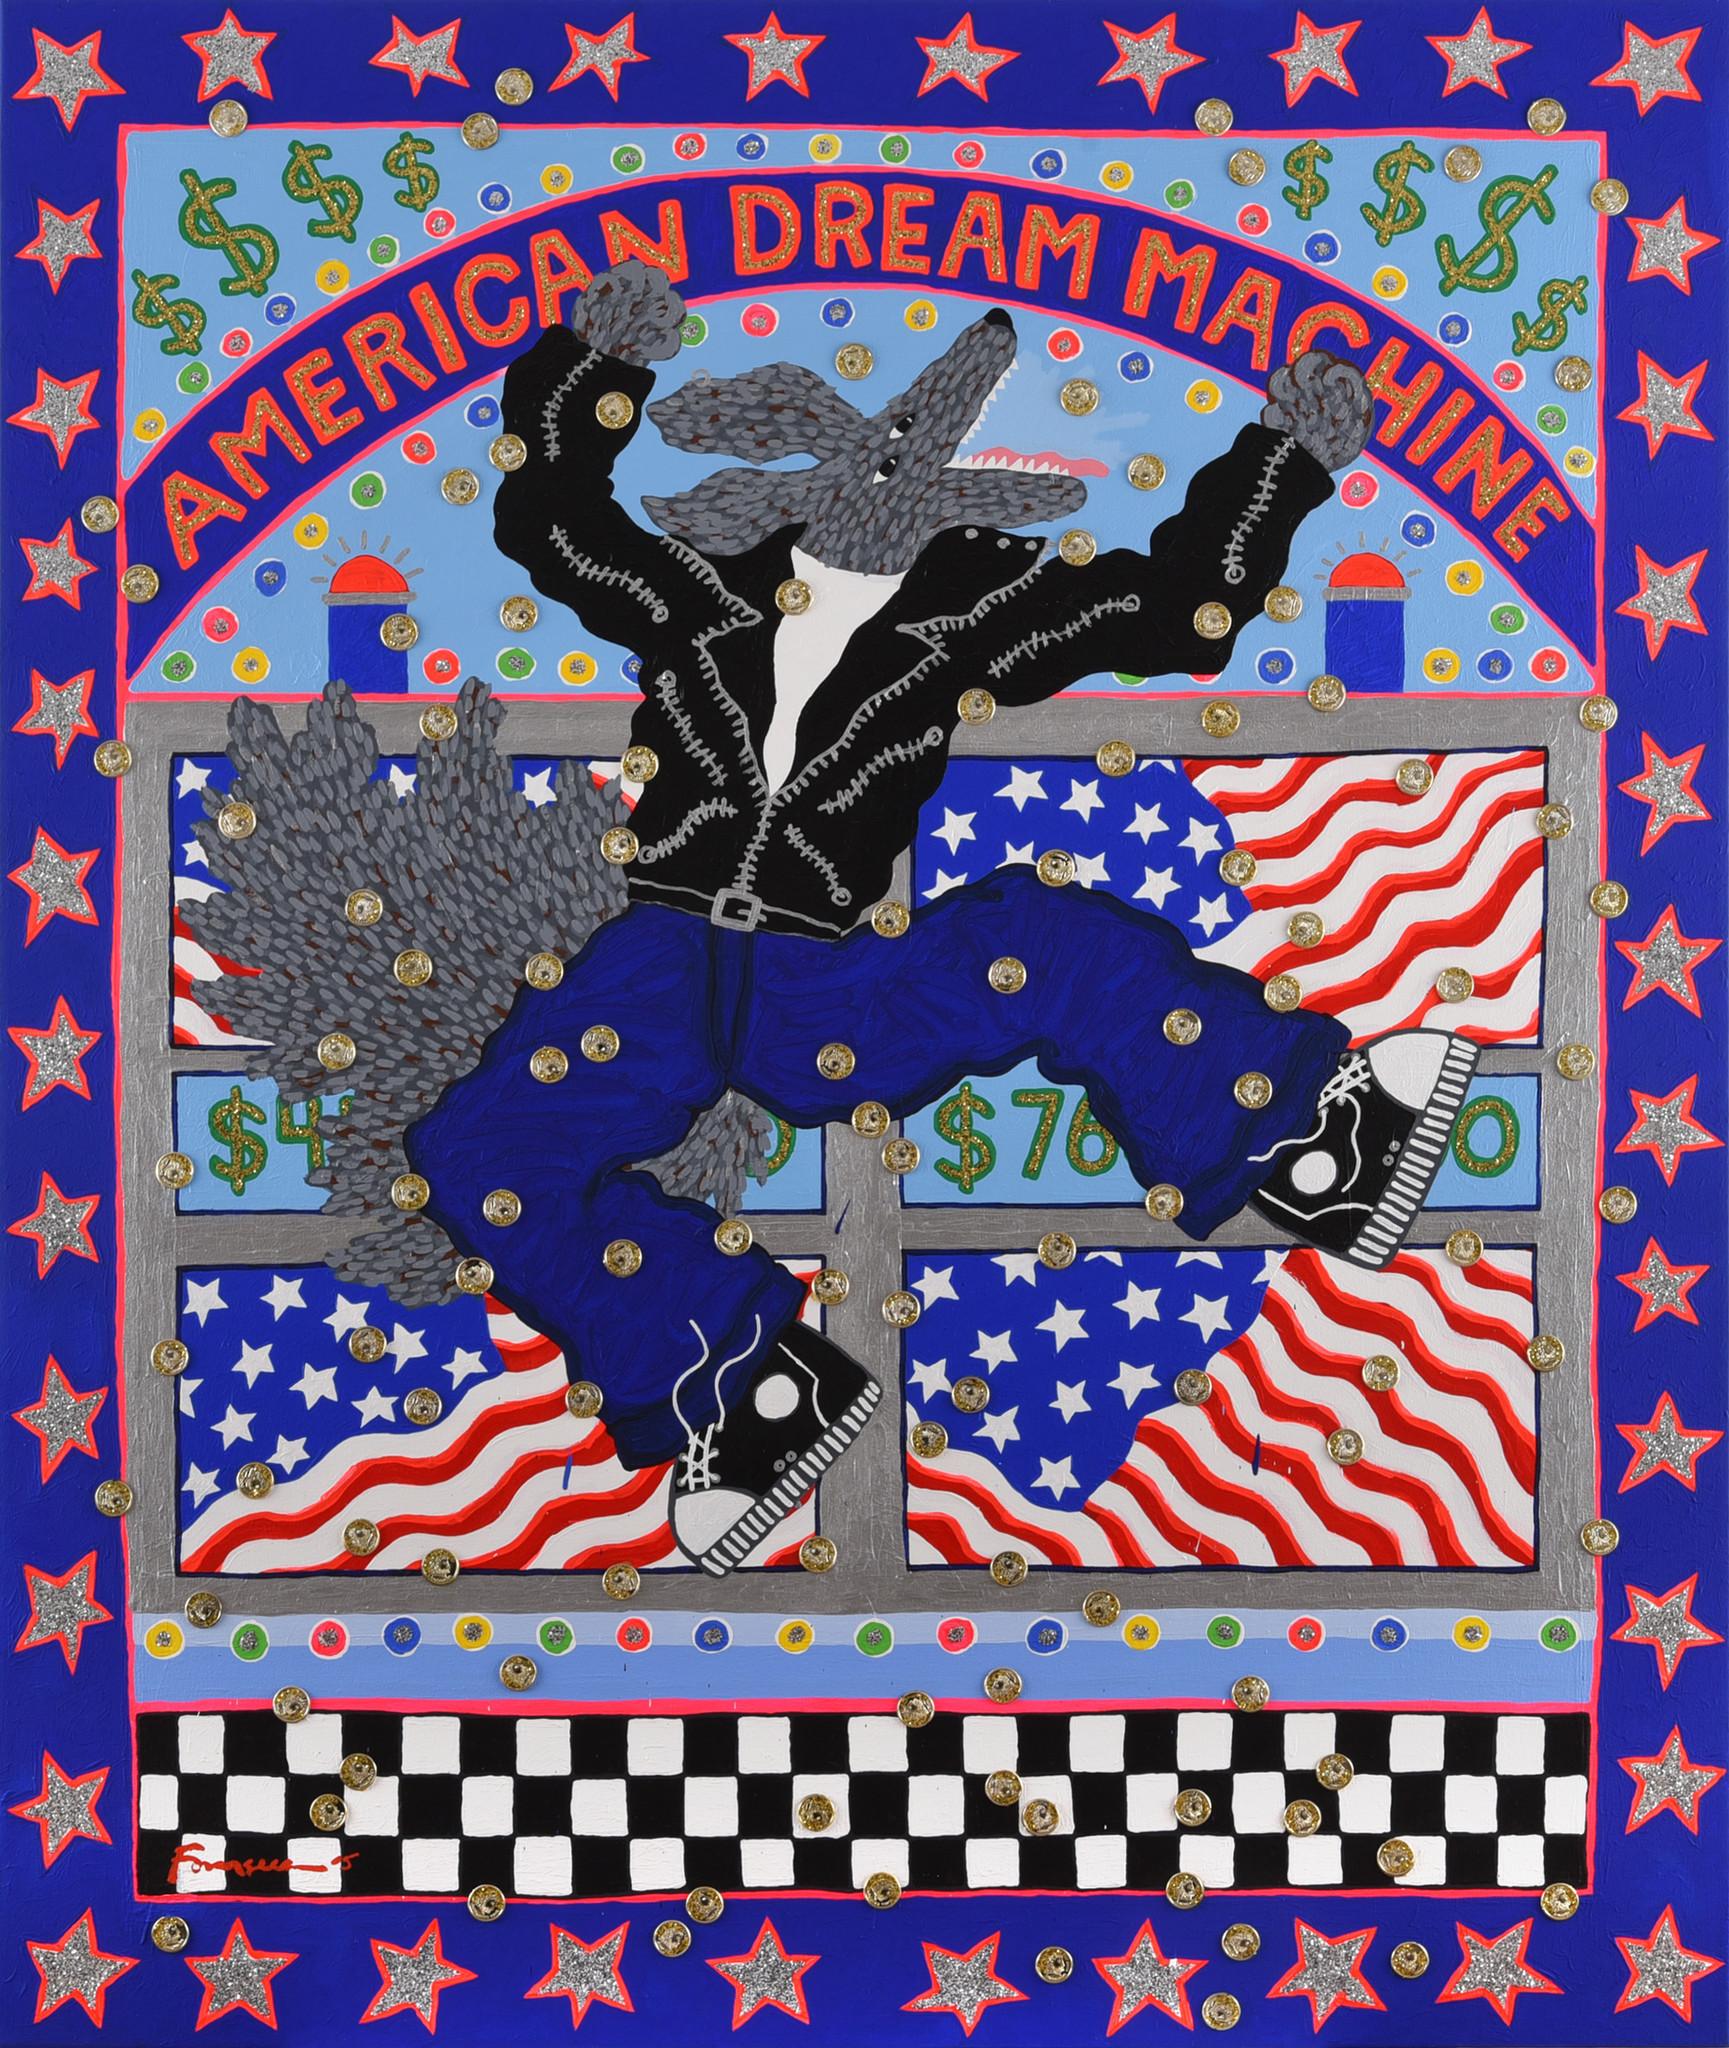 """American Dream Machine,"" 2005. Mixed media on paper."